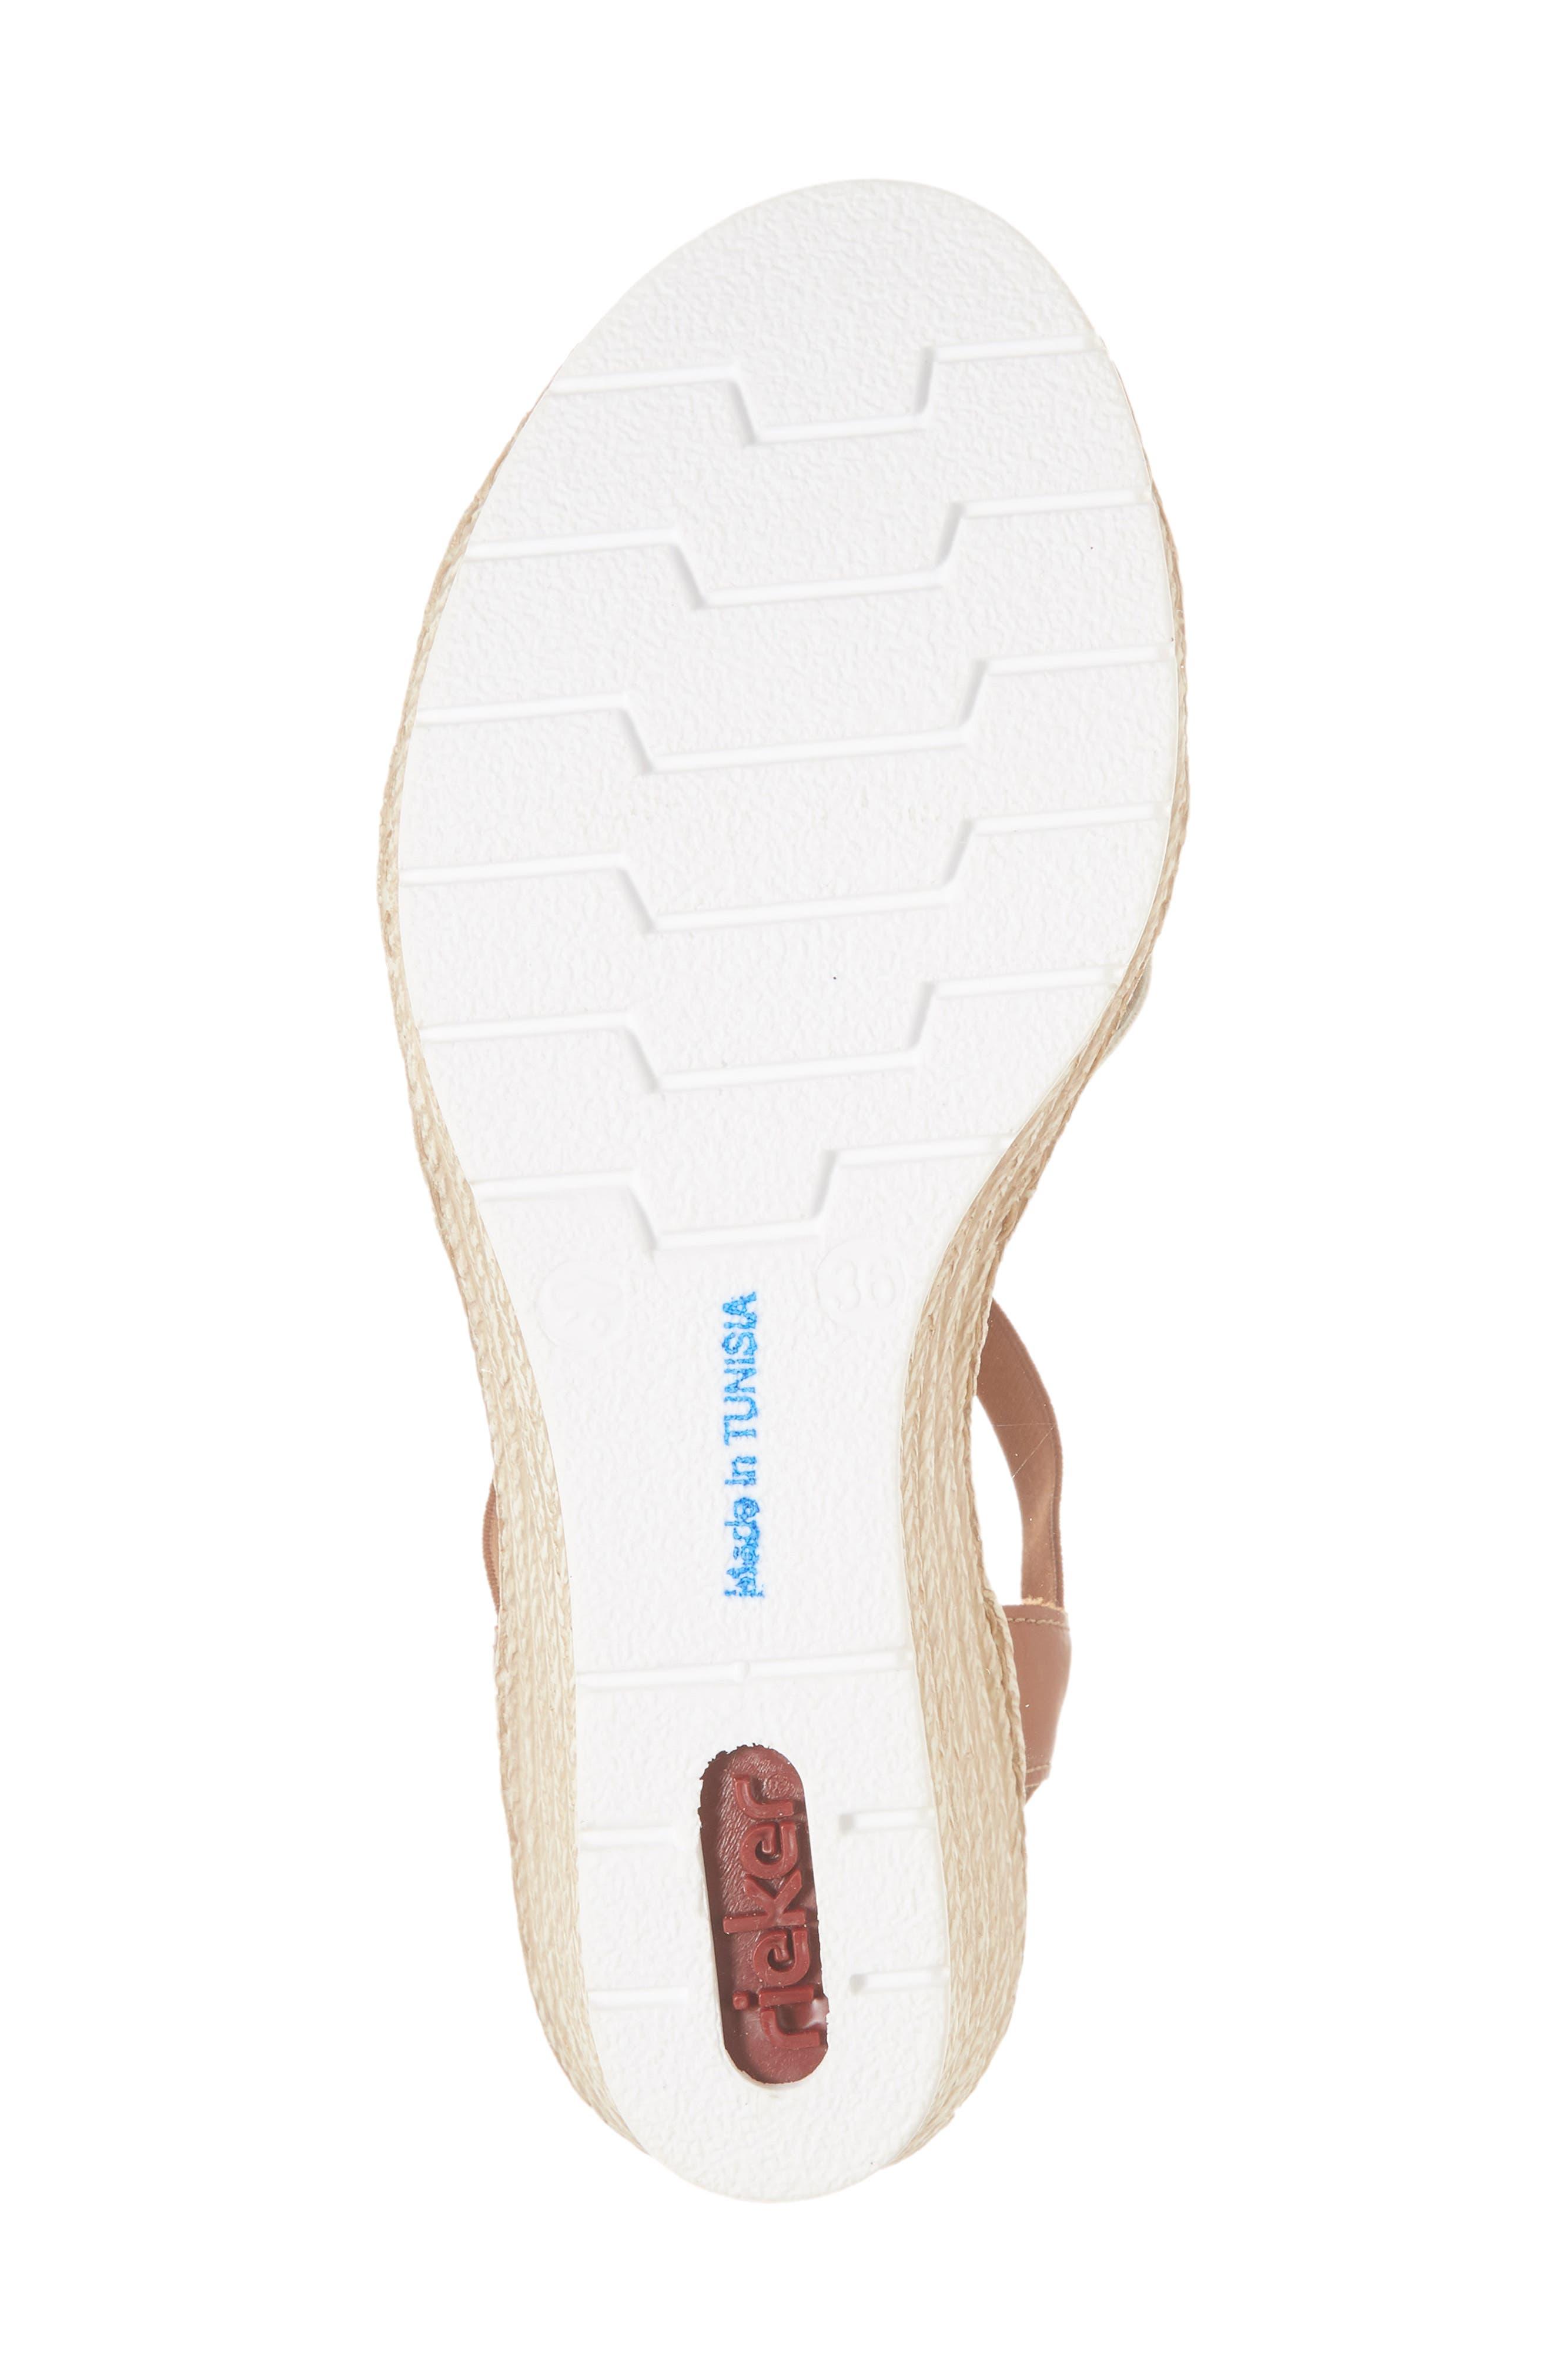 RIEKER ANTISTRESS,                             Fanni 95 Espadrille Wedge Sandal,                             Alternate thumbnail 6, color,                             BIANCO/ CAYENNE